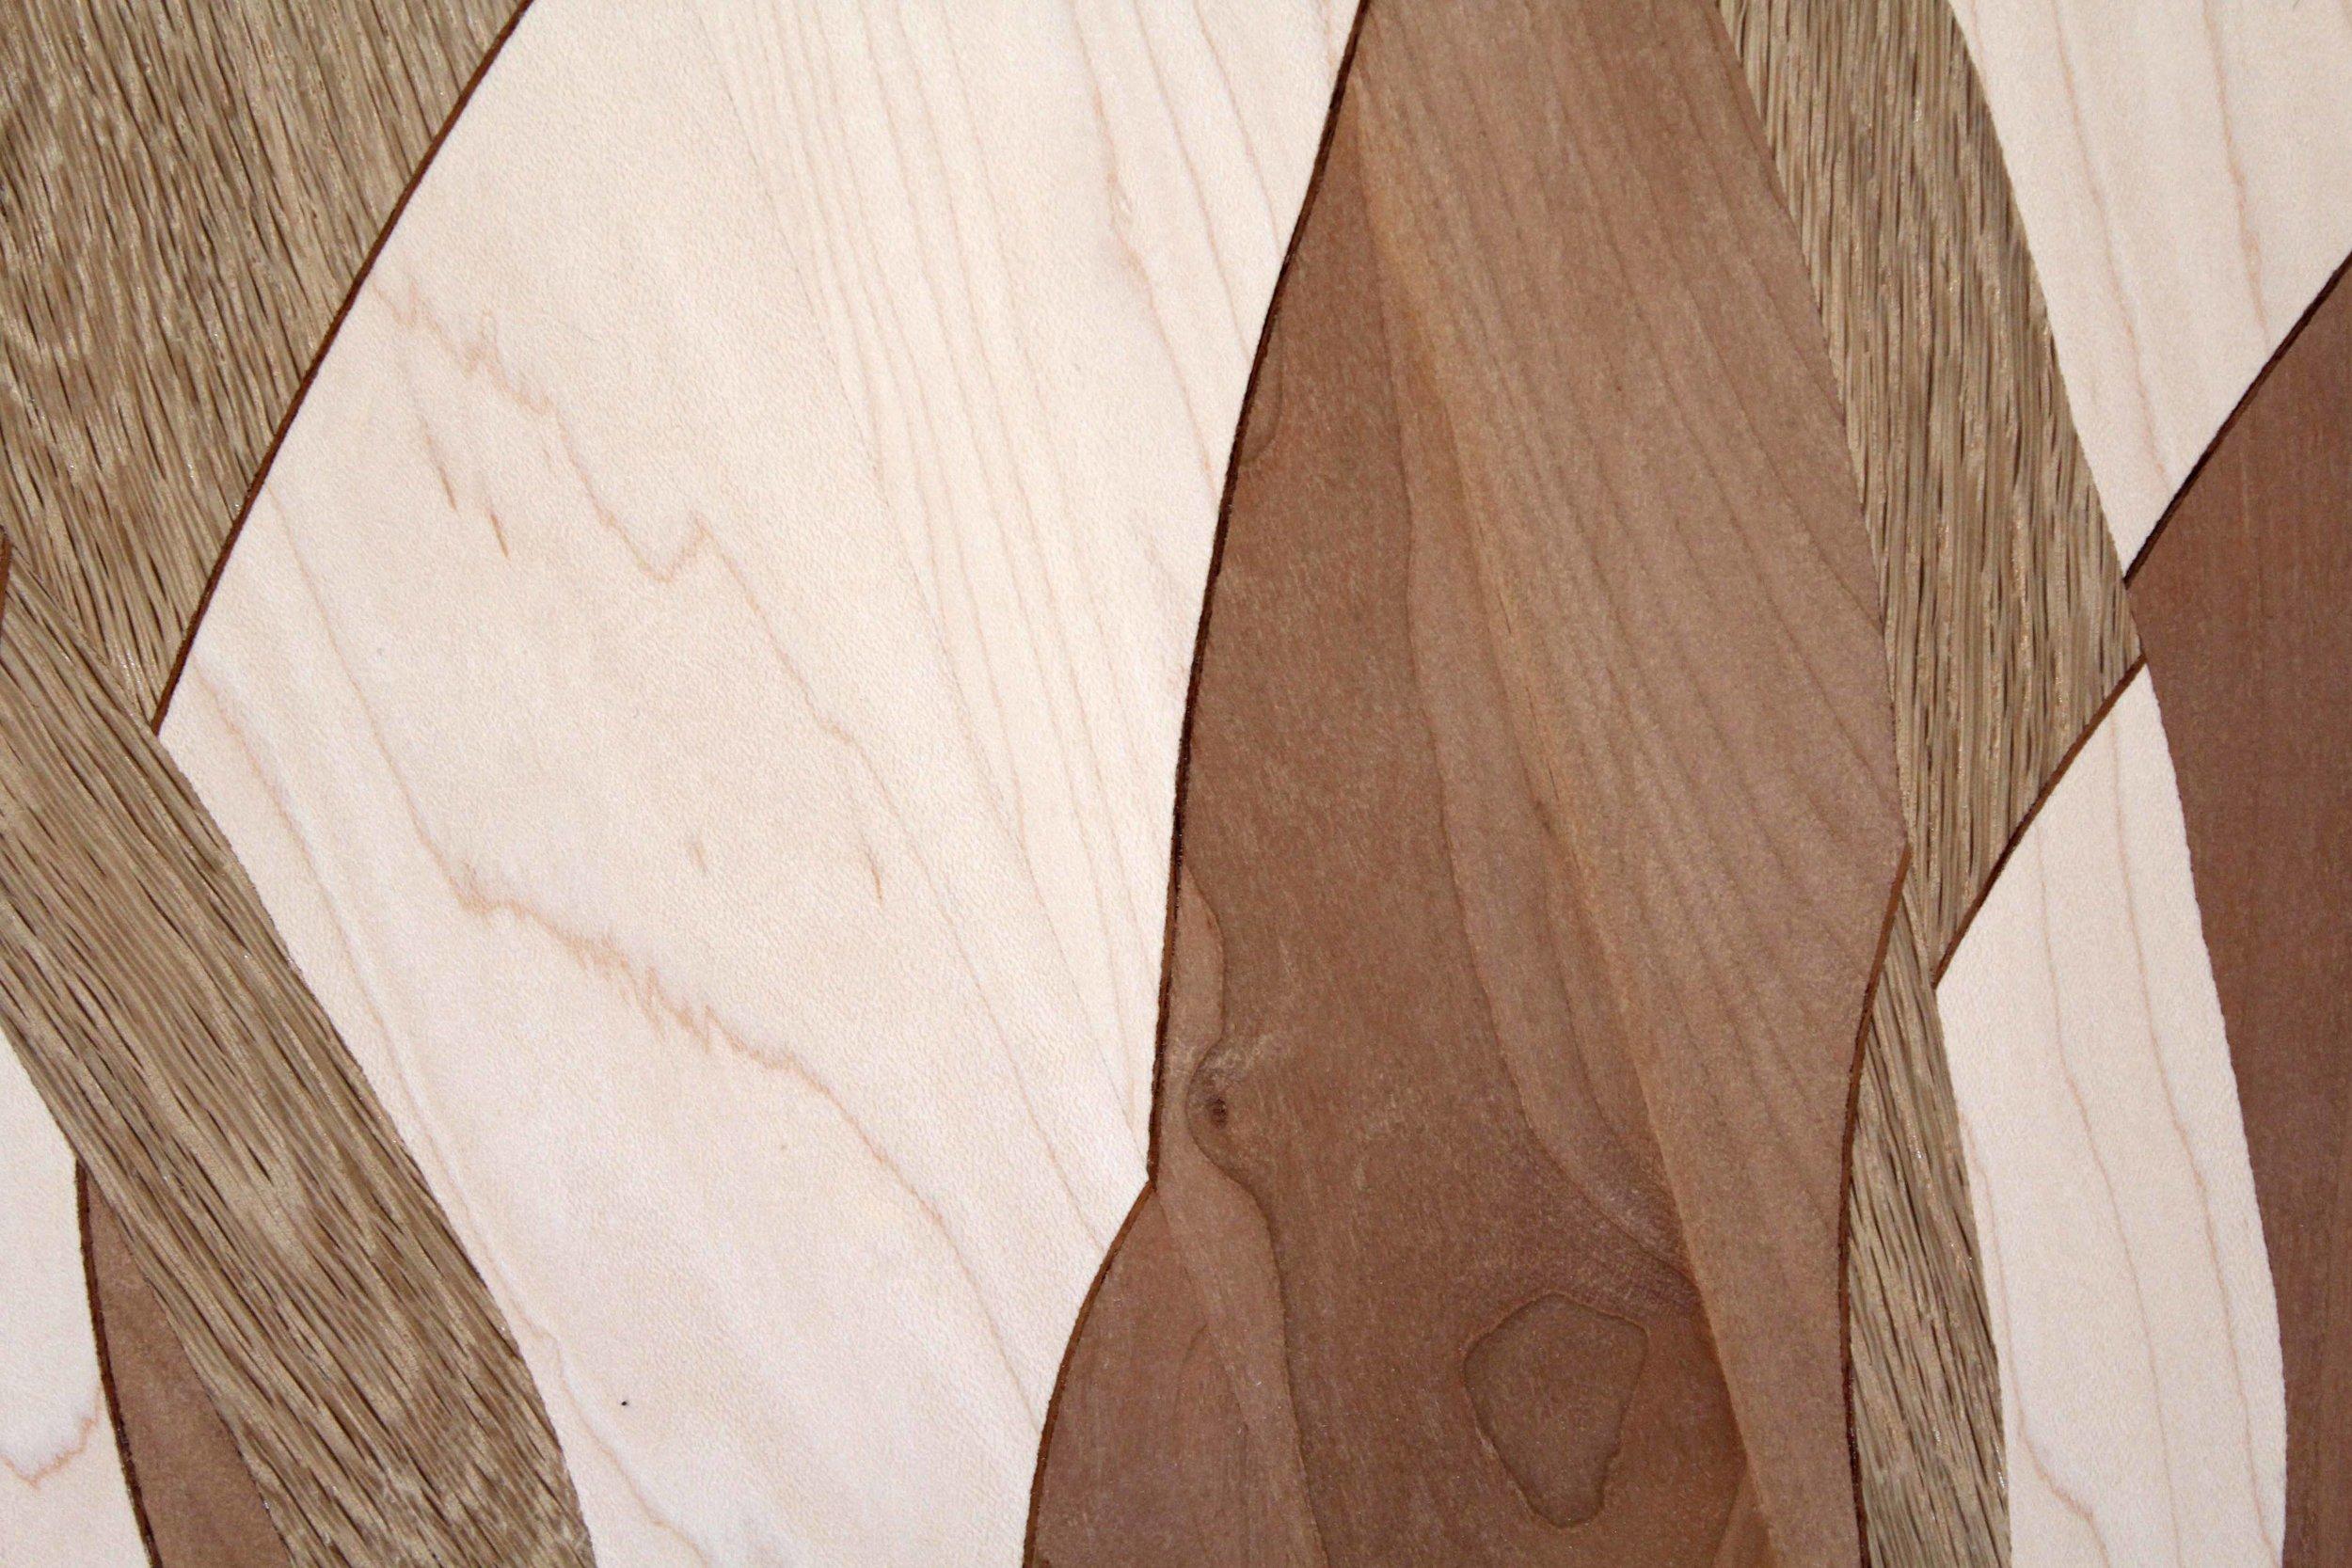 Curved - Wood ShopFall 2017